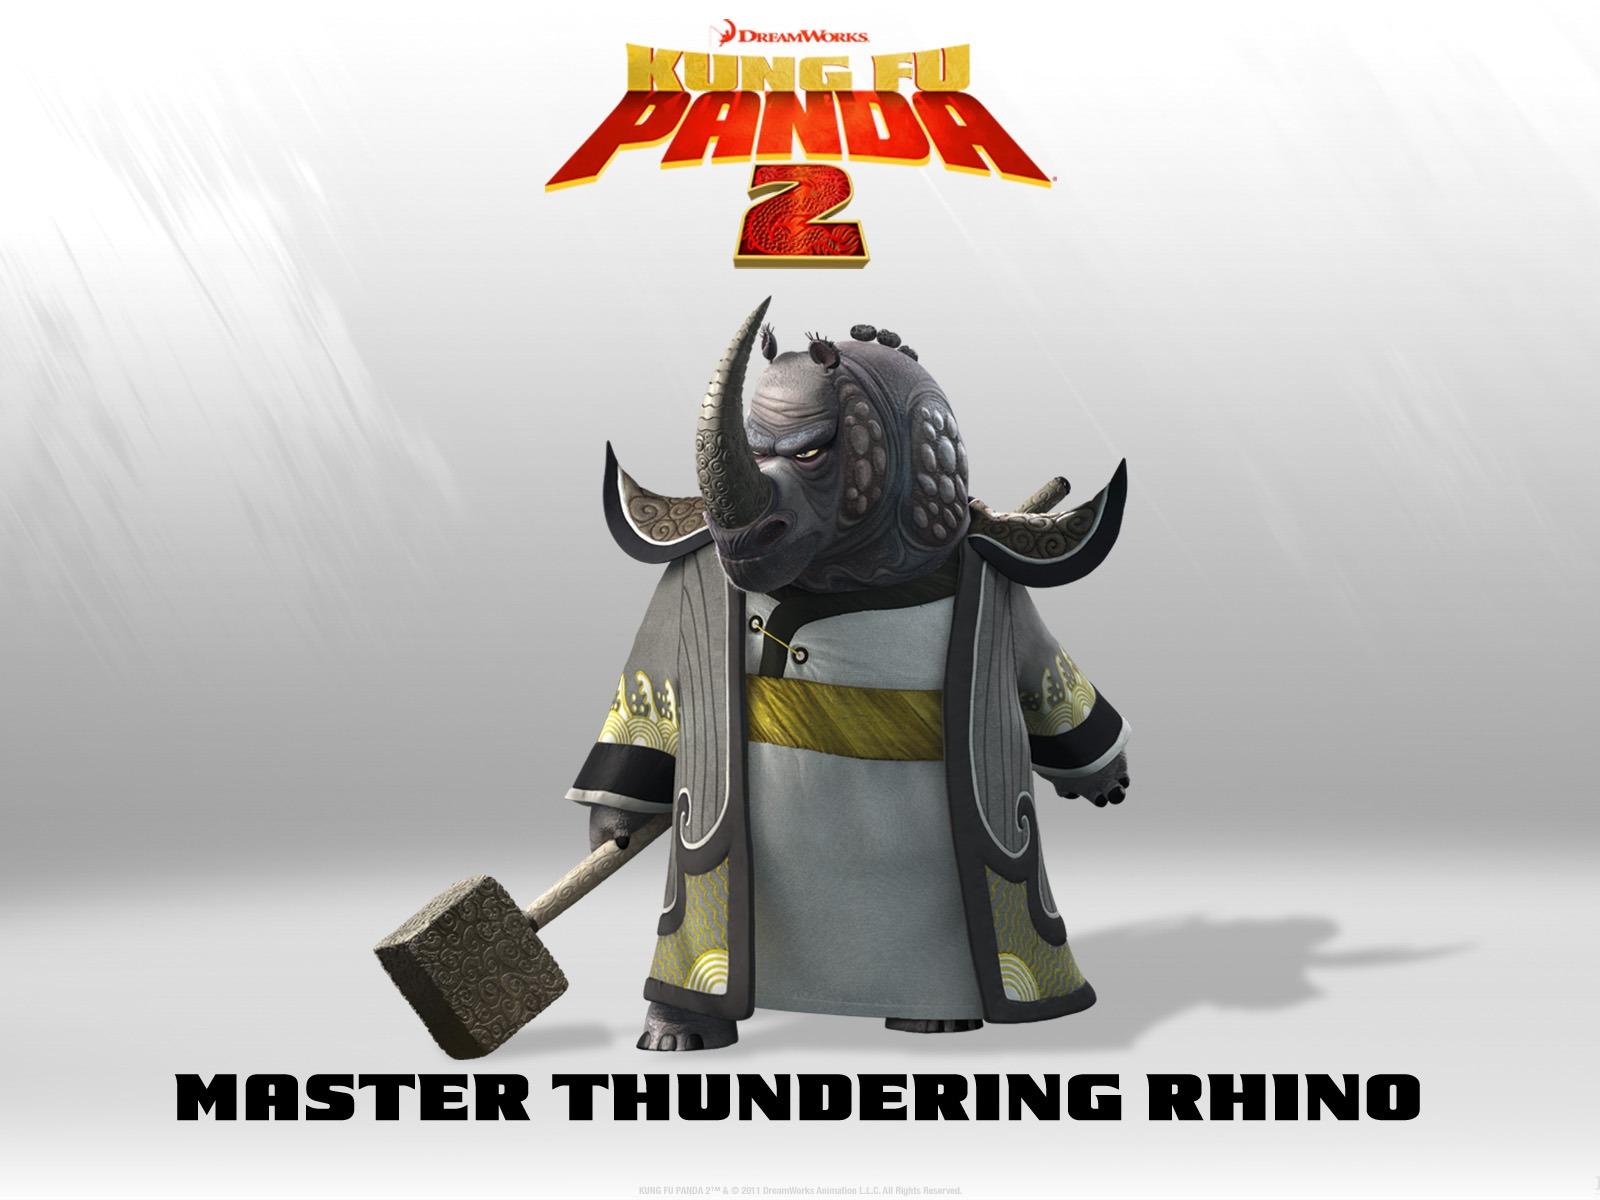 Kung fu panda 2 fonds d 39 cran hd 16 1600x1200 fond d - Kung fu panda 3 telecharger ...